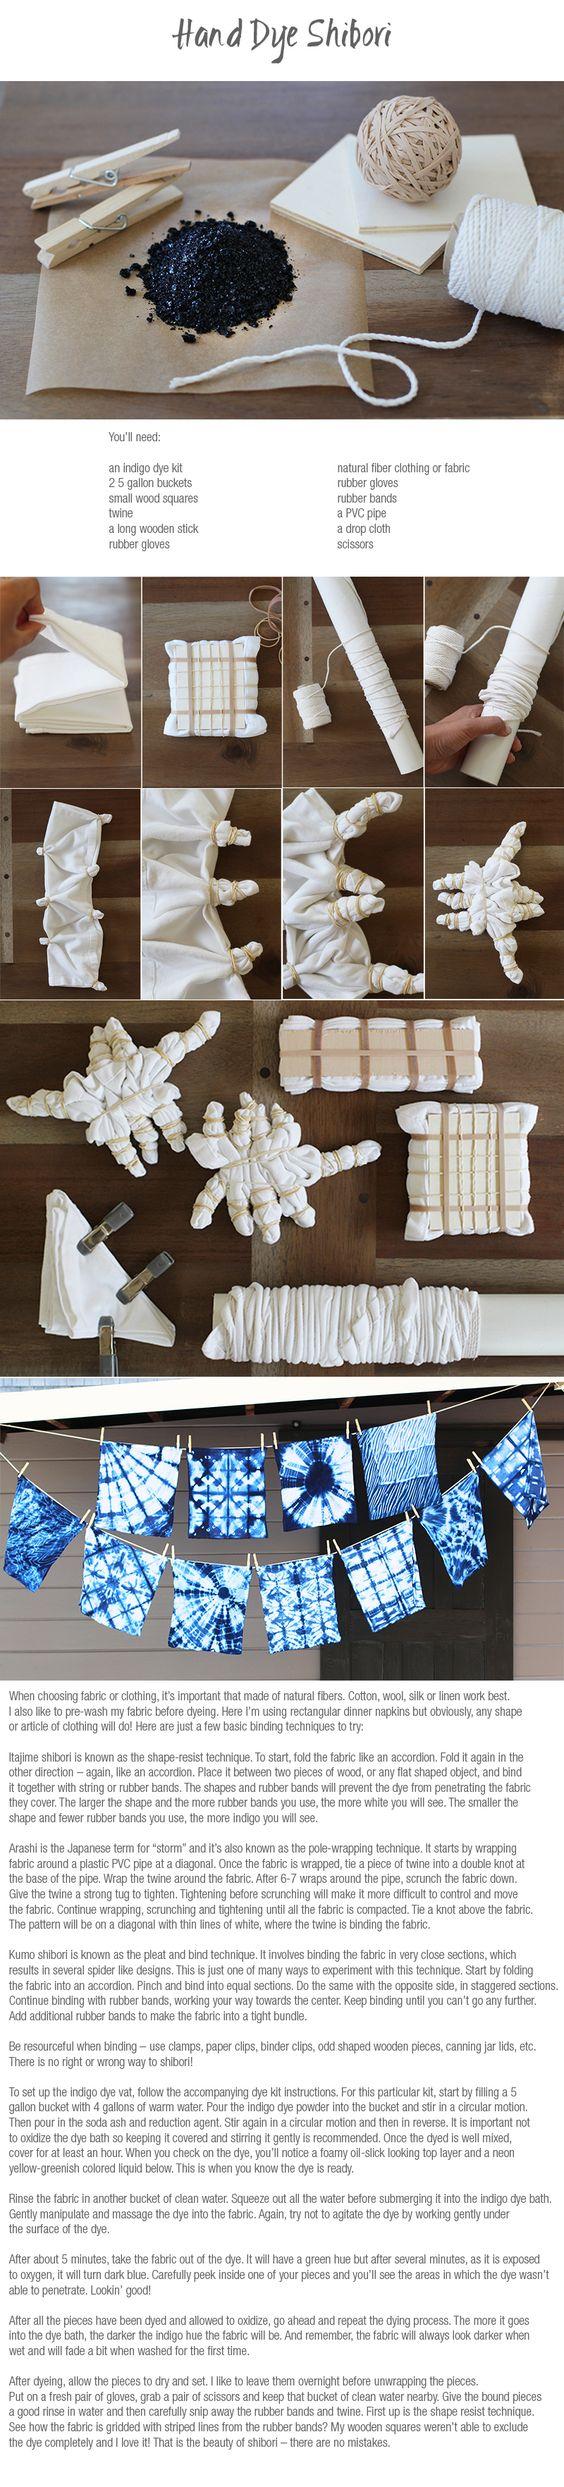 Hand dye shibori: